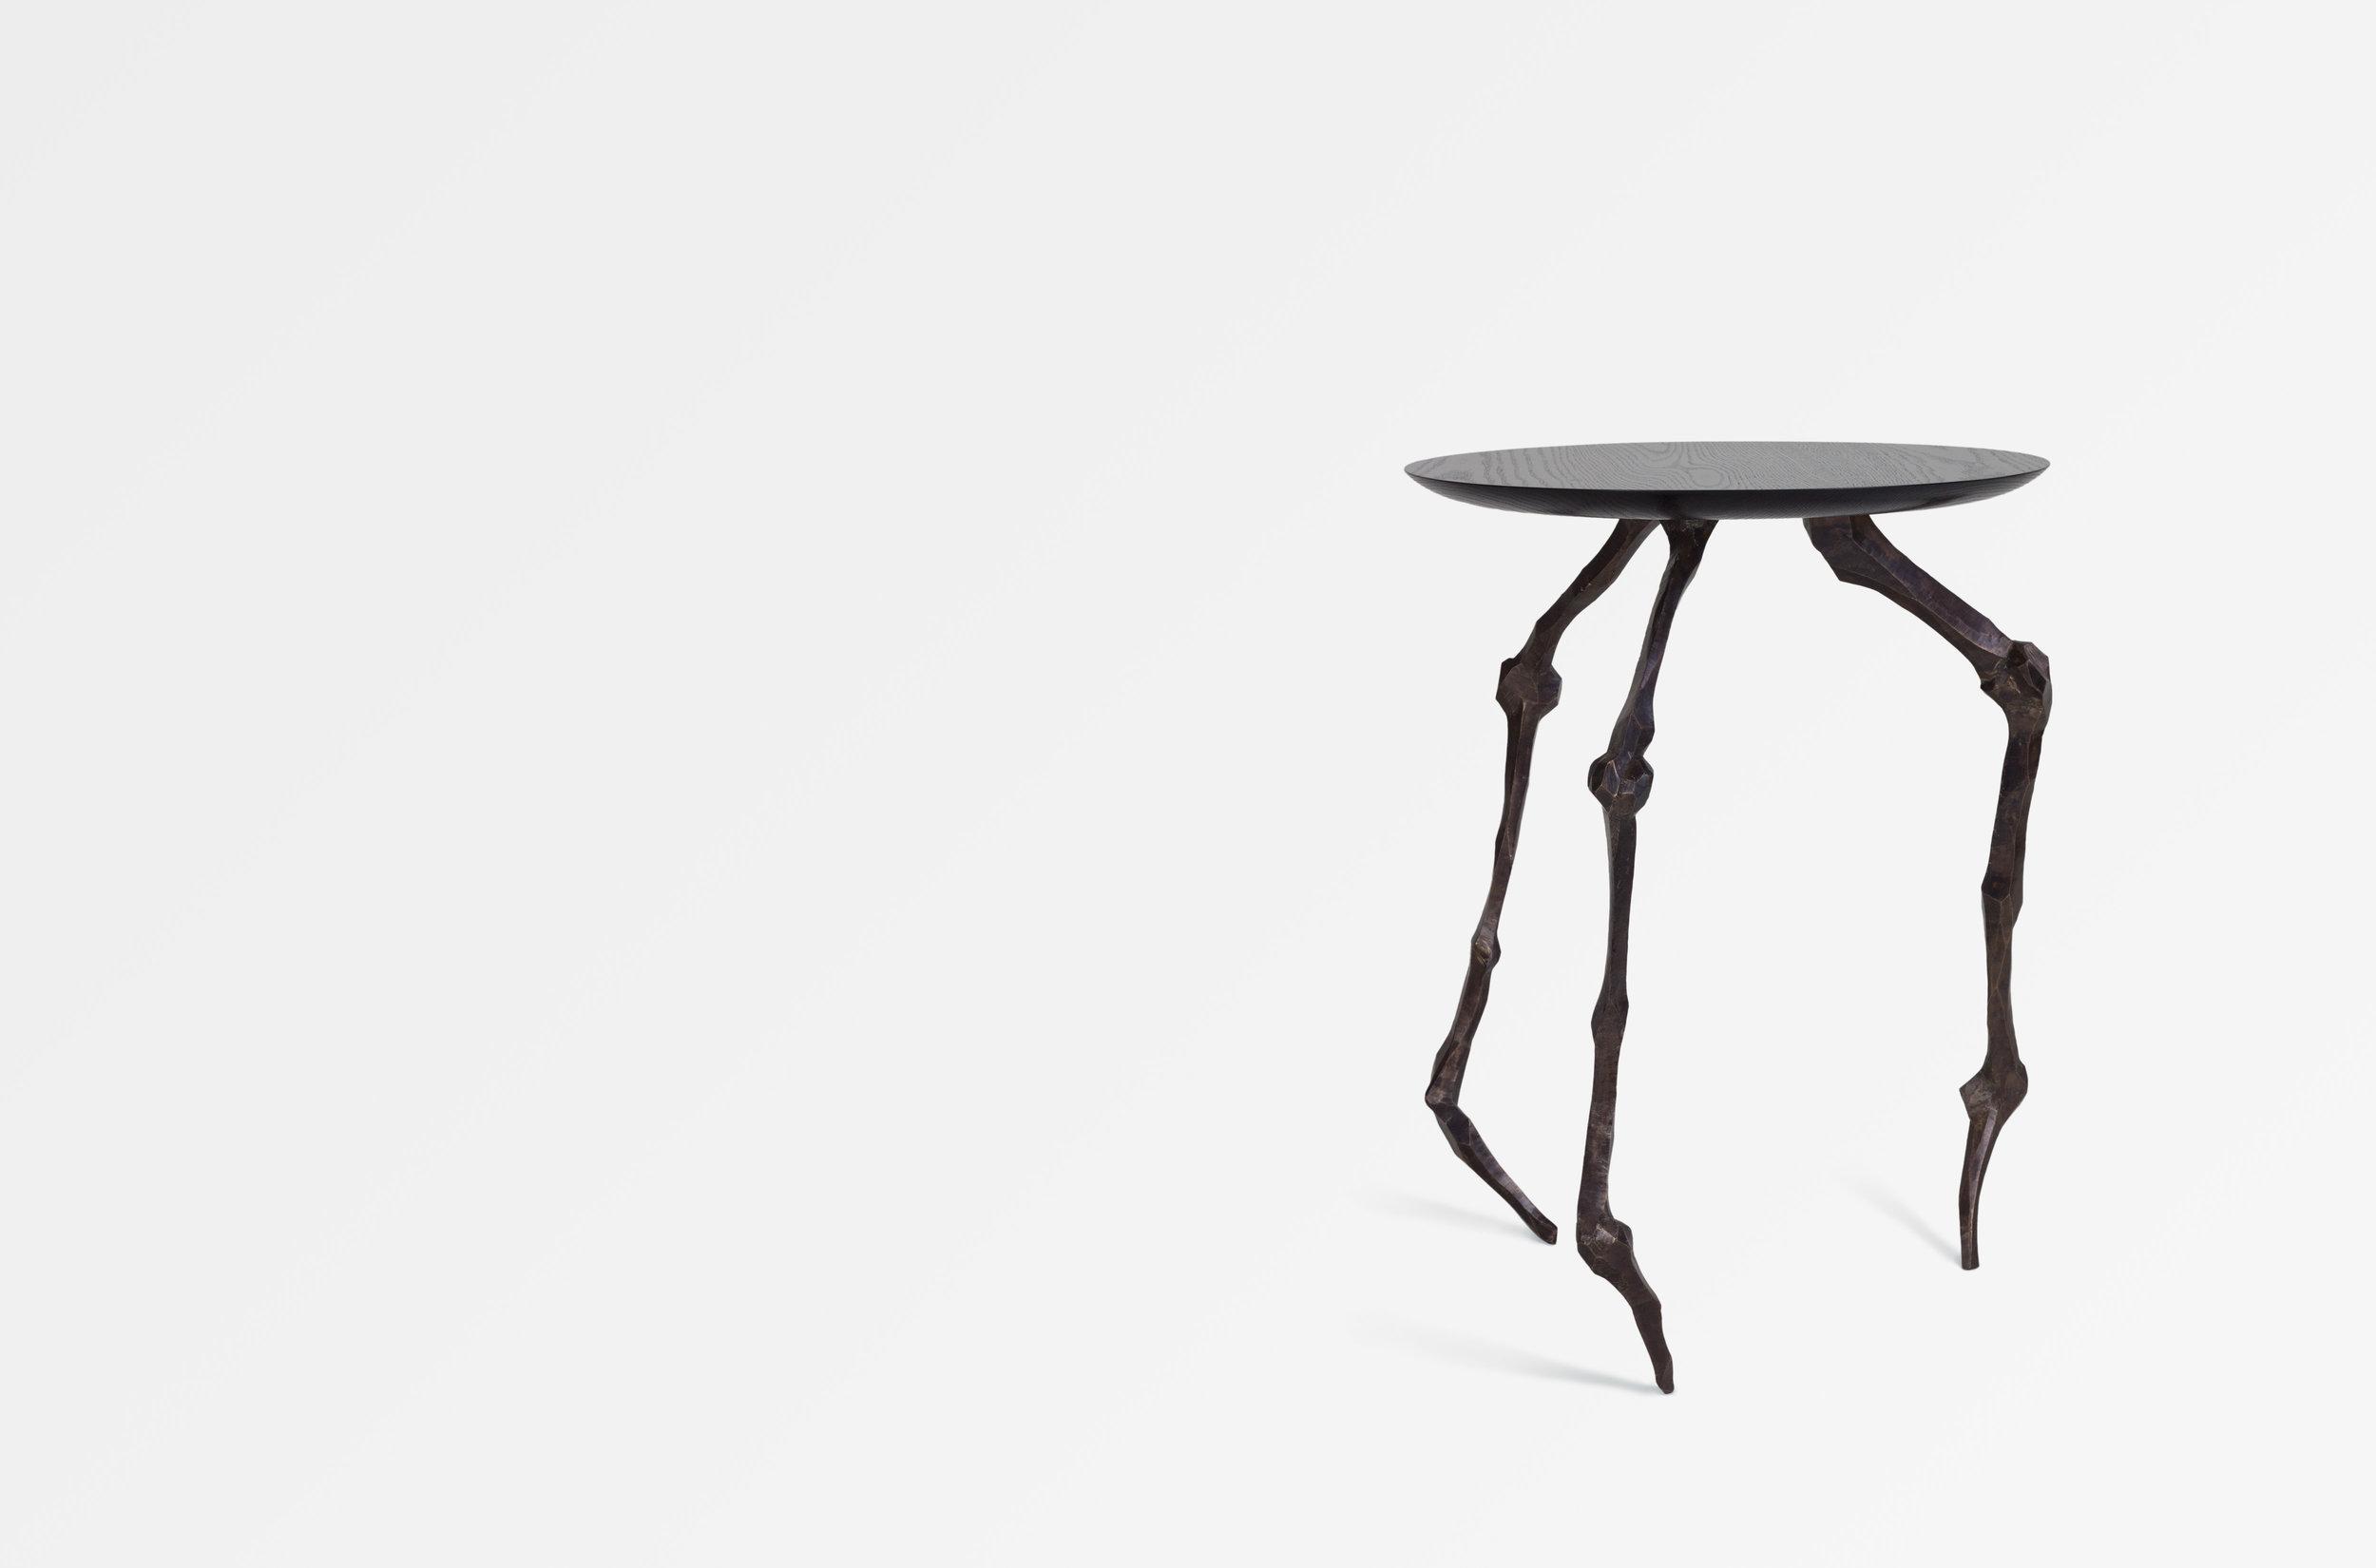 JAK-Creature-Table-001.jpg